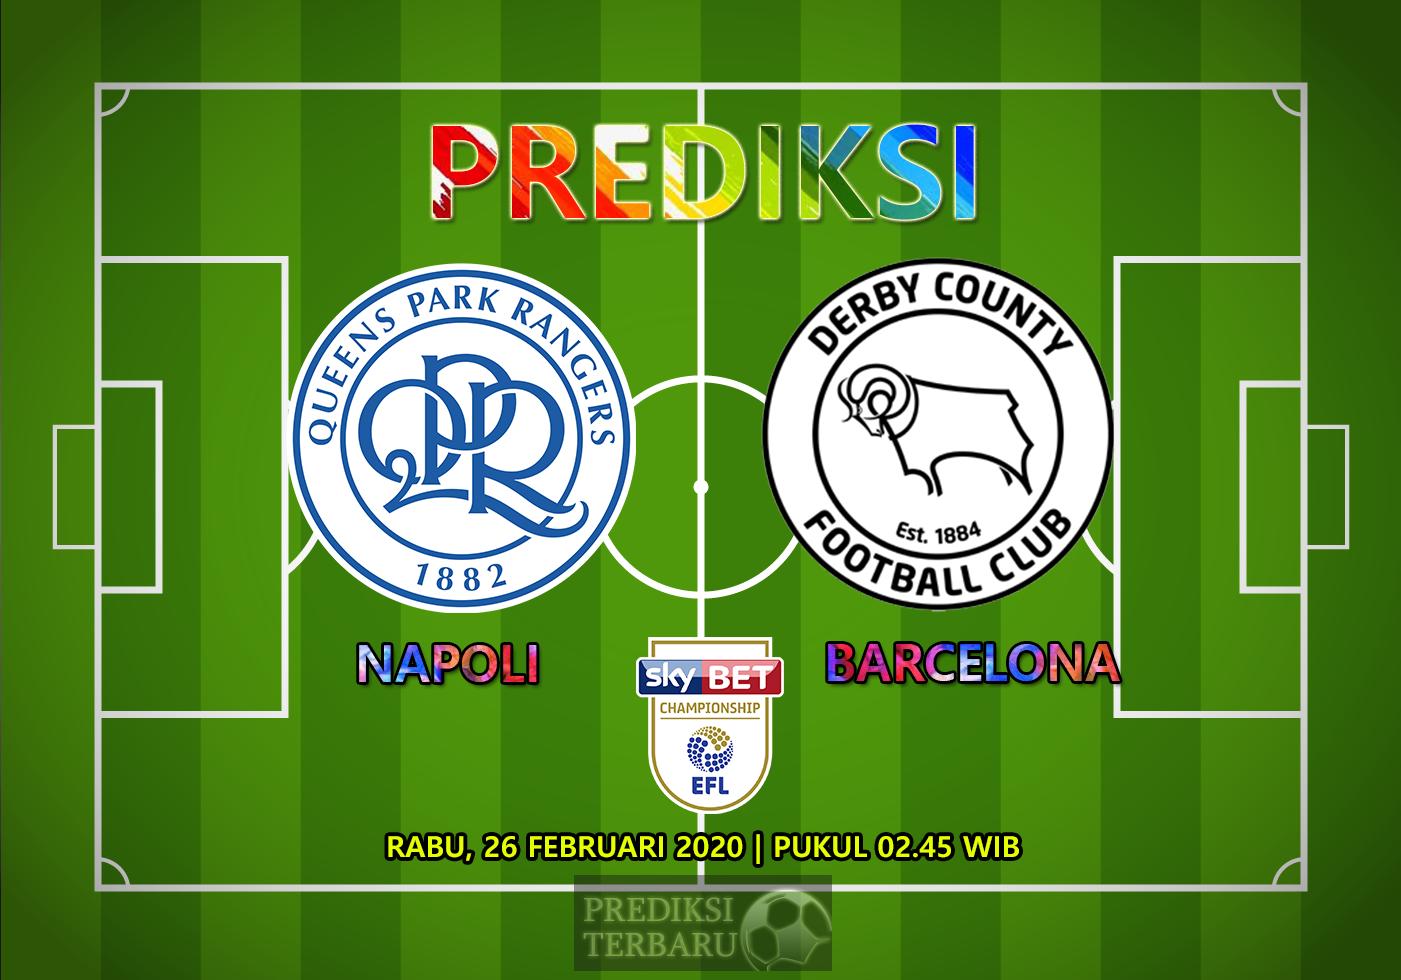 Prediksi Queens Park Rangers Vs Derby County, Rabu 26 Februari